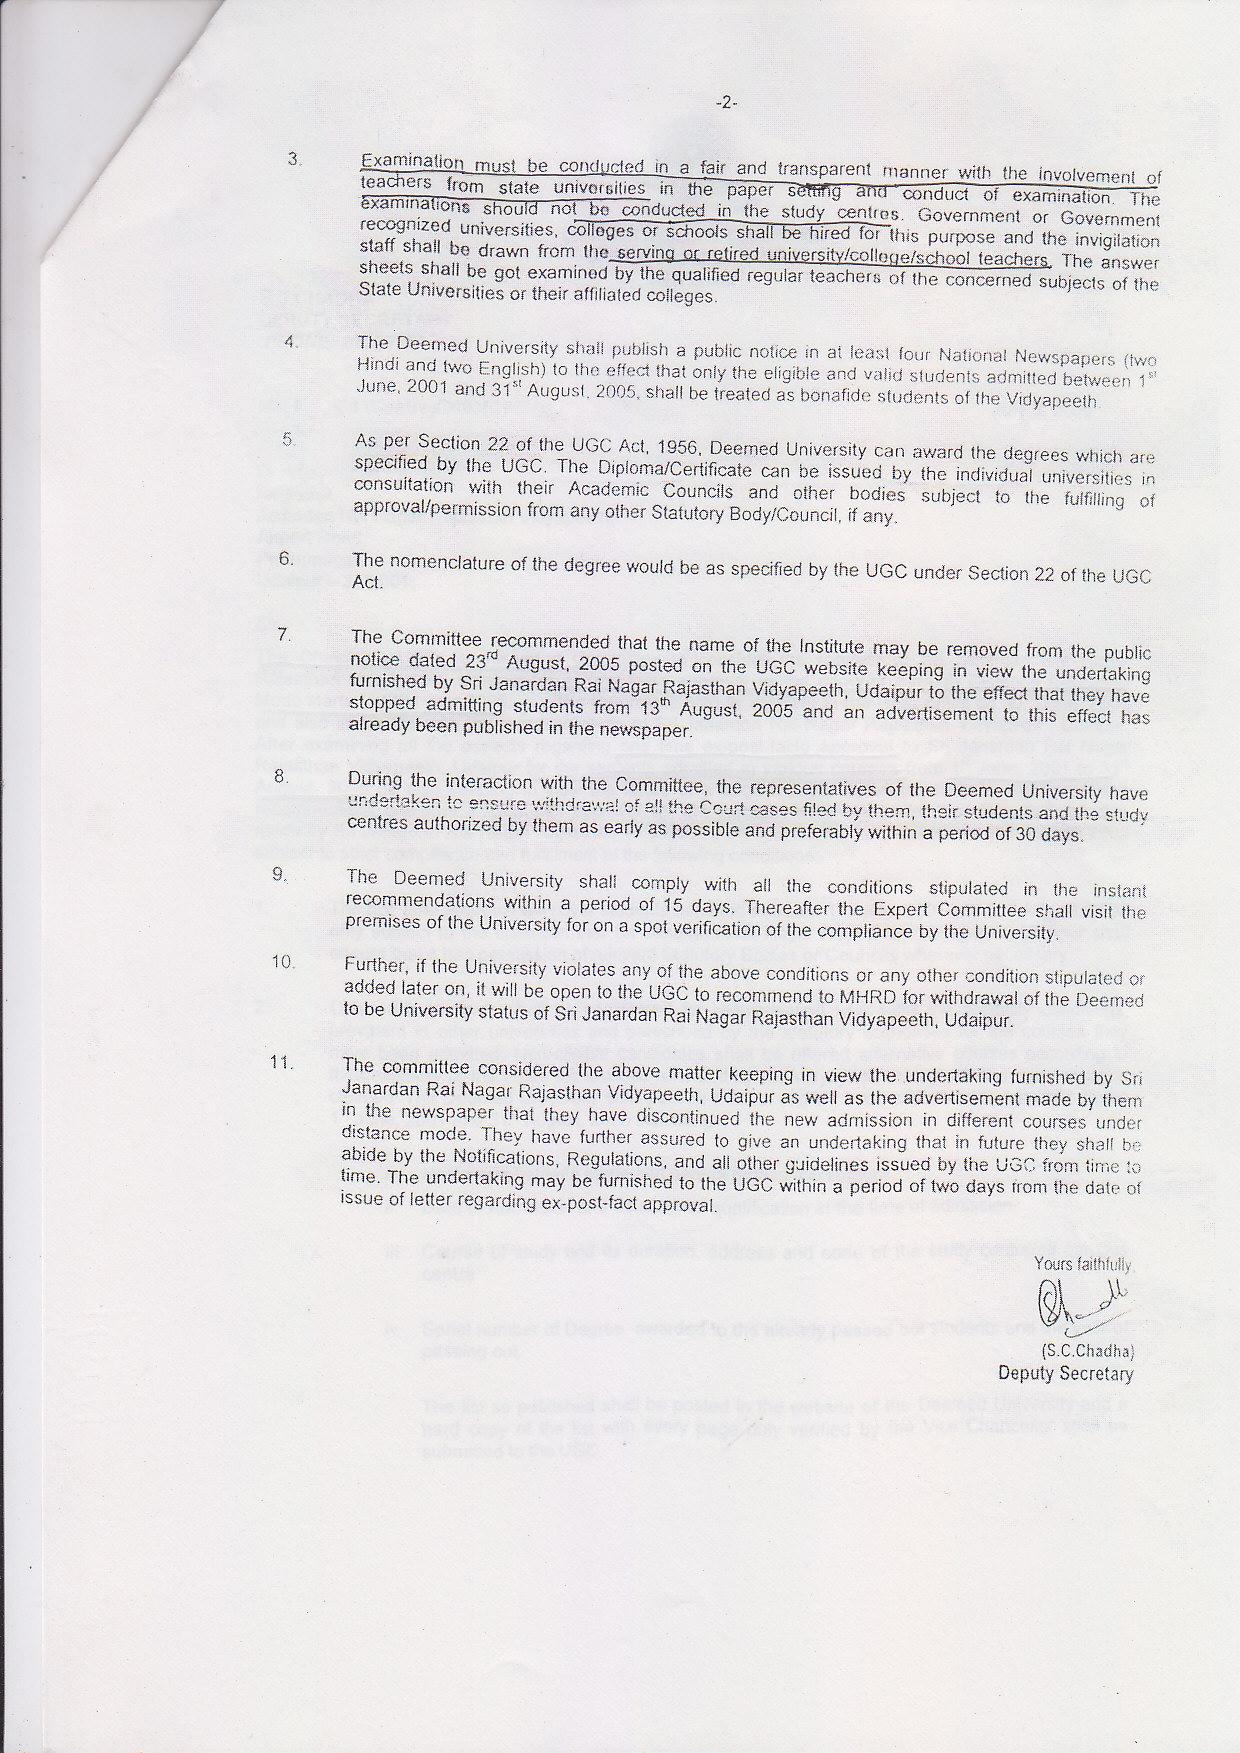 Janardan rai nagar rajasthan vidyapeeth deemed university udaipur janardan rai nagar rajasthan vidyapeeth deemed university udaipur 331401rajasthan rvduniversity gives unauthorized fake degrees rti yelopaper Image collections